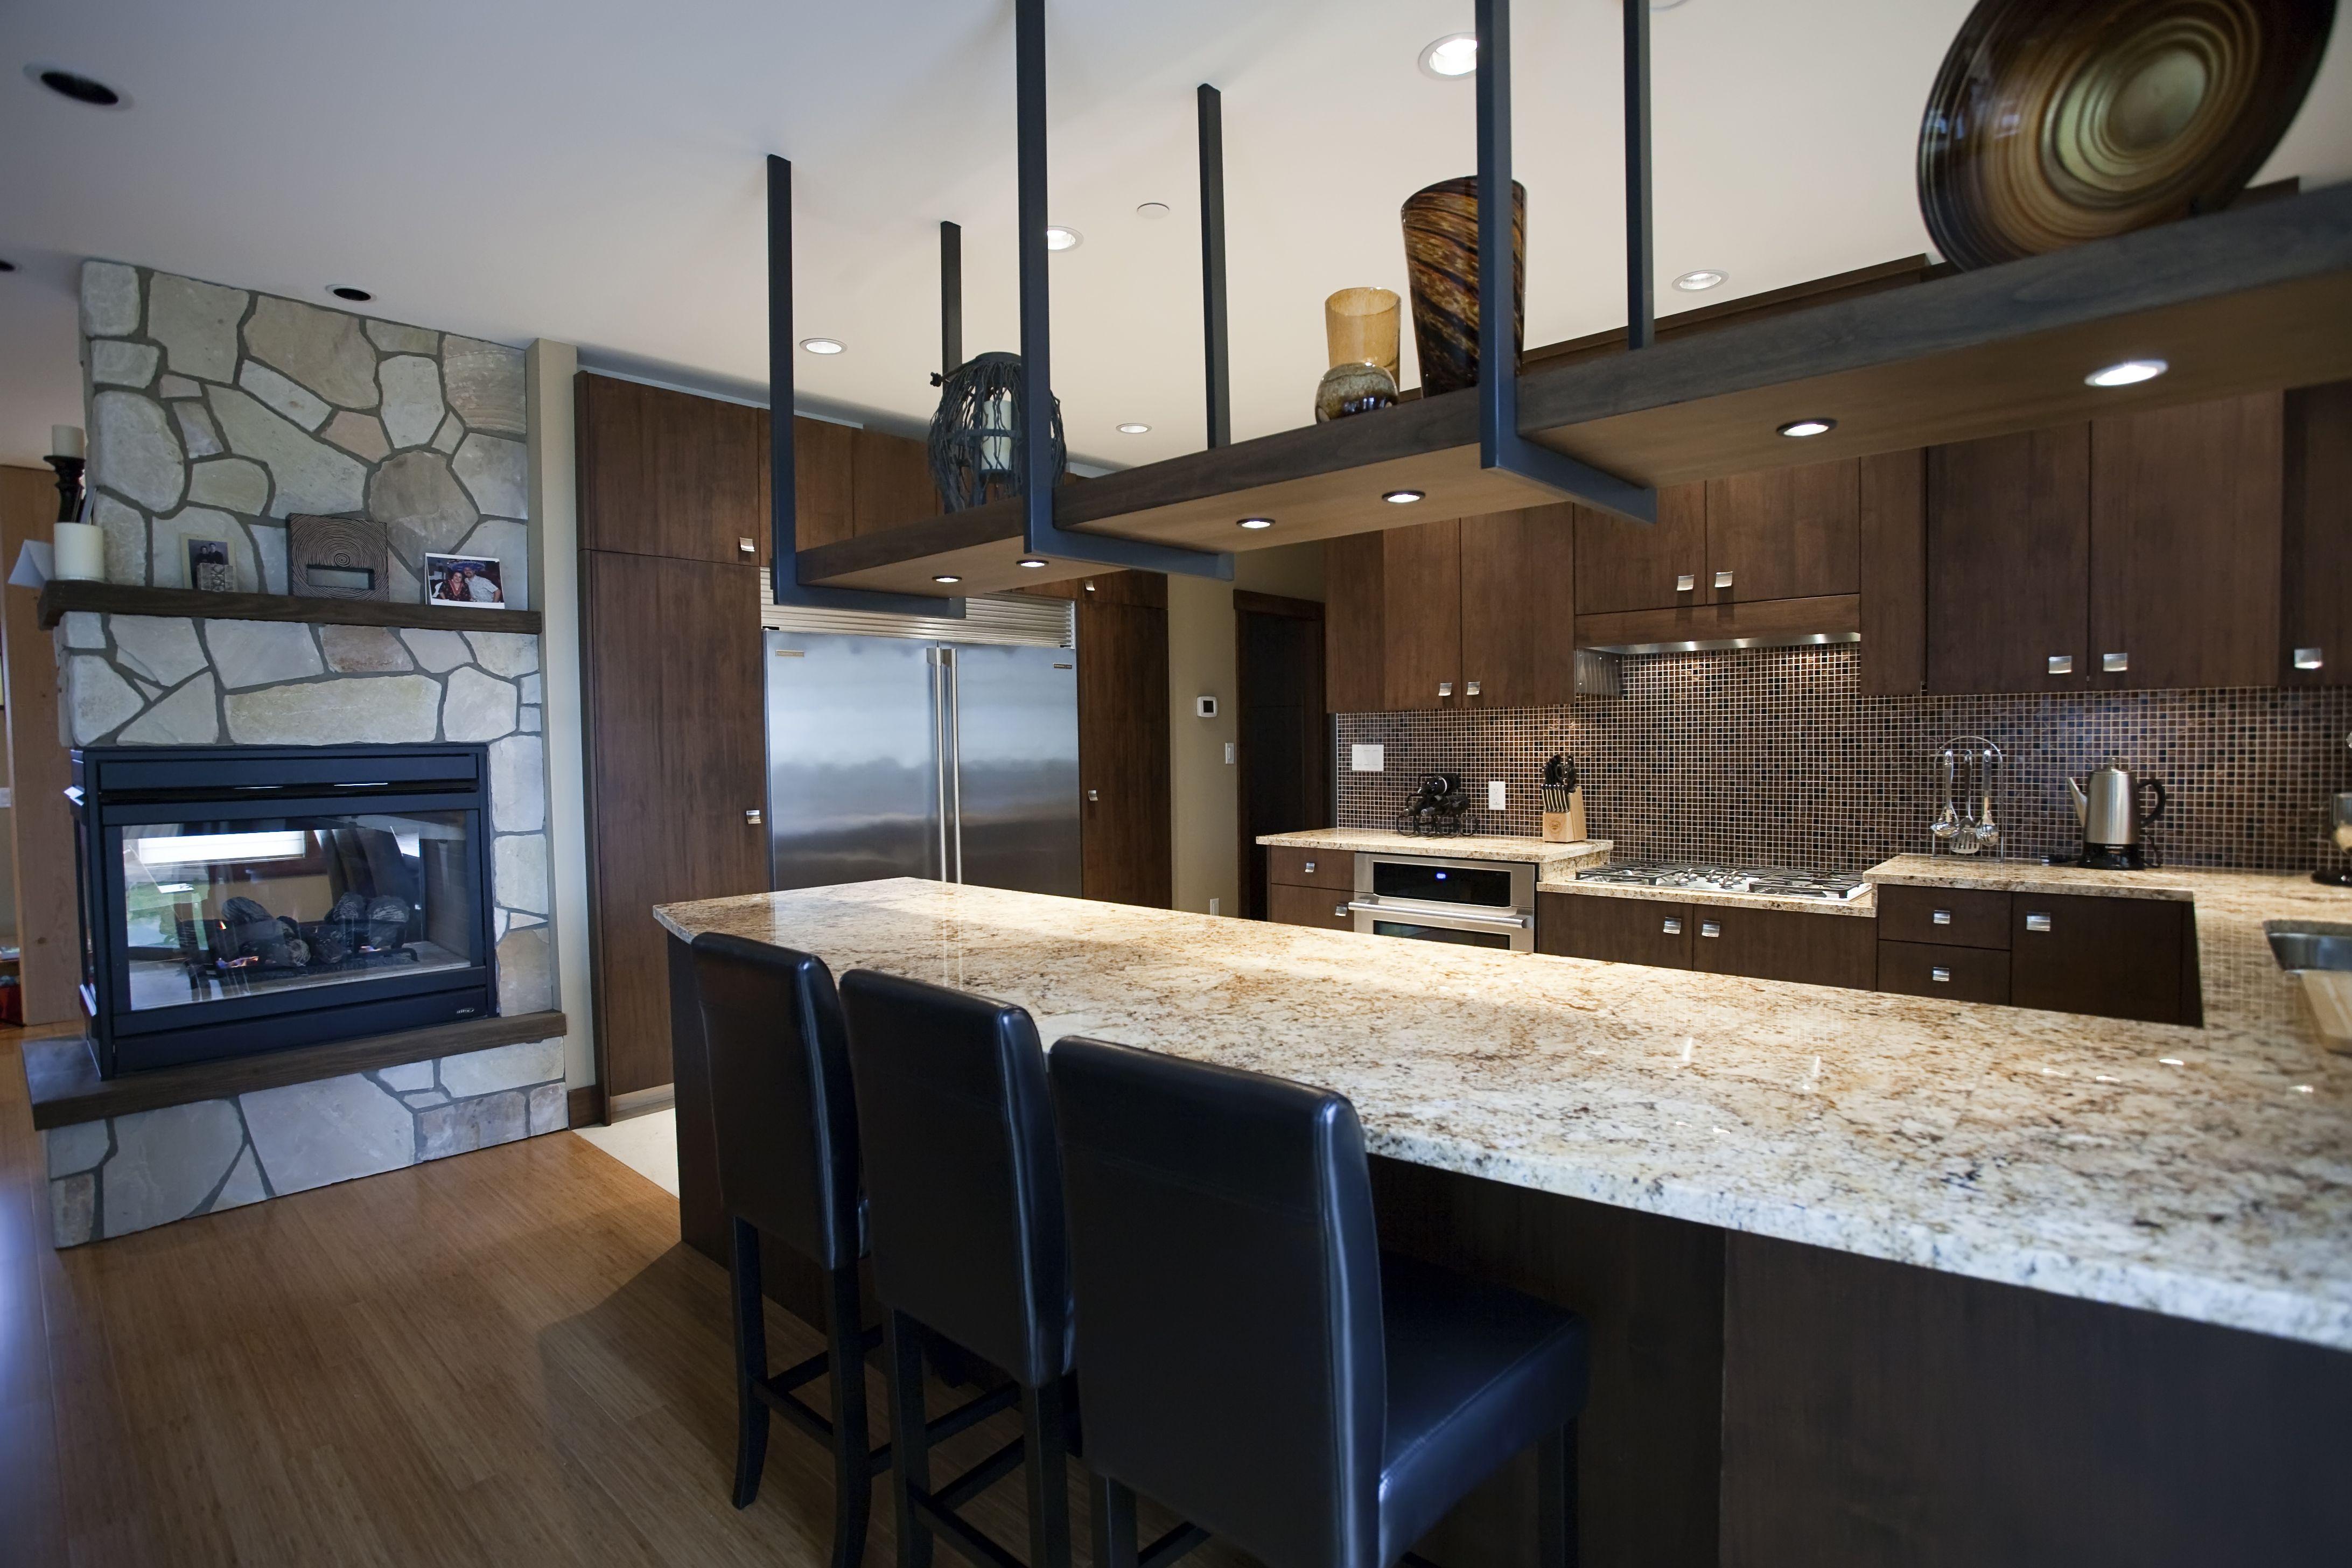 ccsrtip tuesday countertops countertops for kitchens Granite in CCSR Kitchen Below Butcher